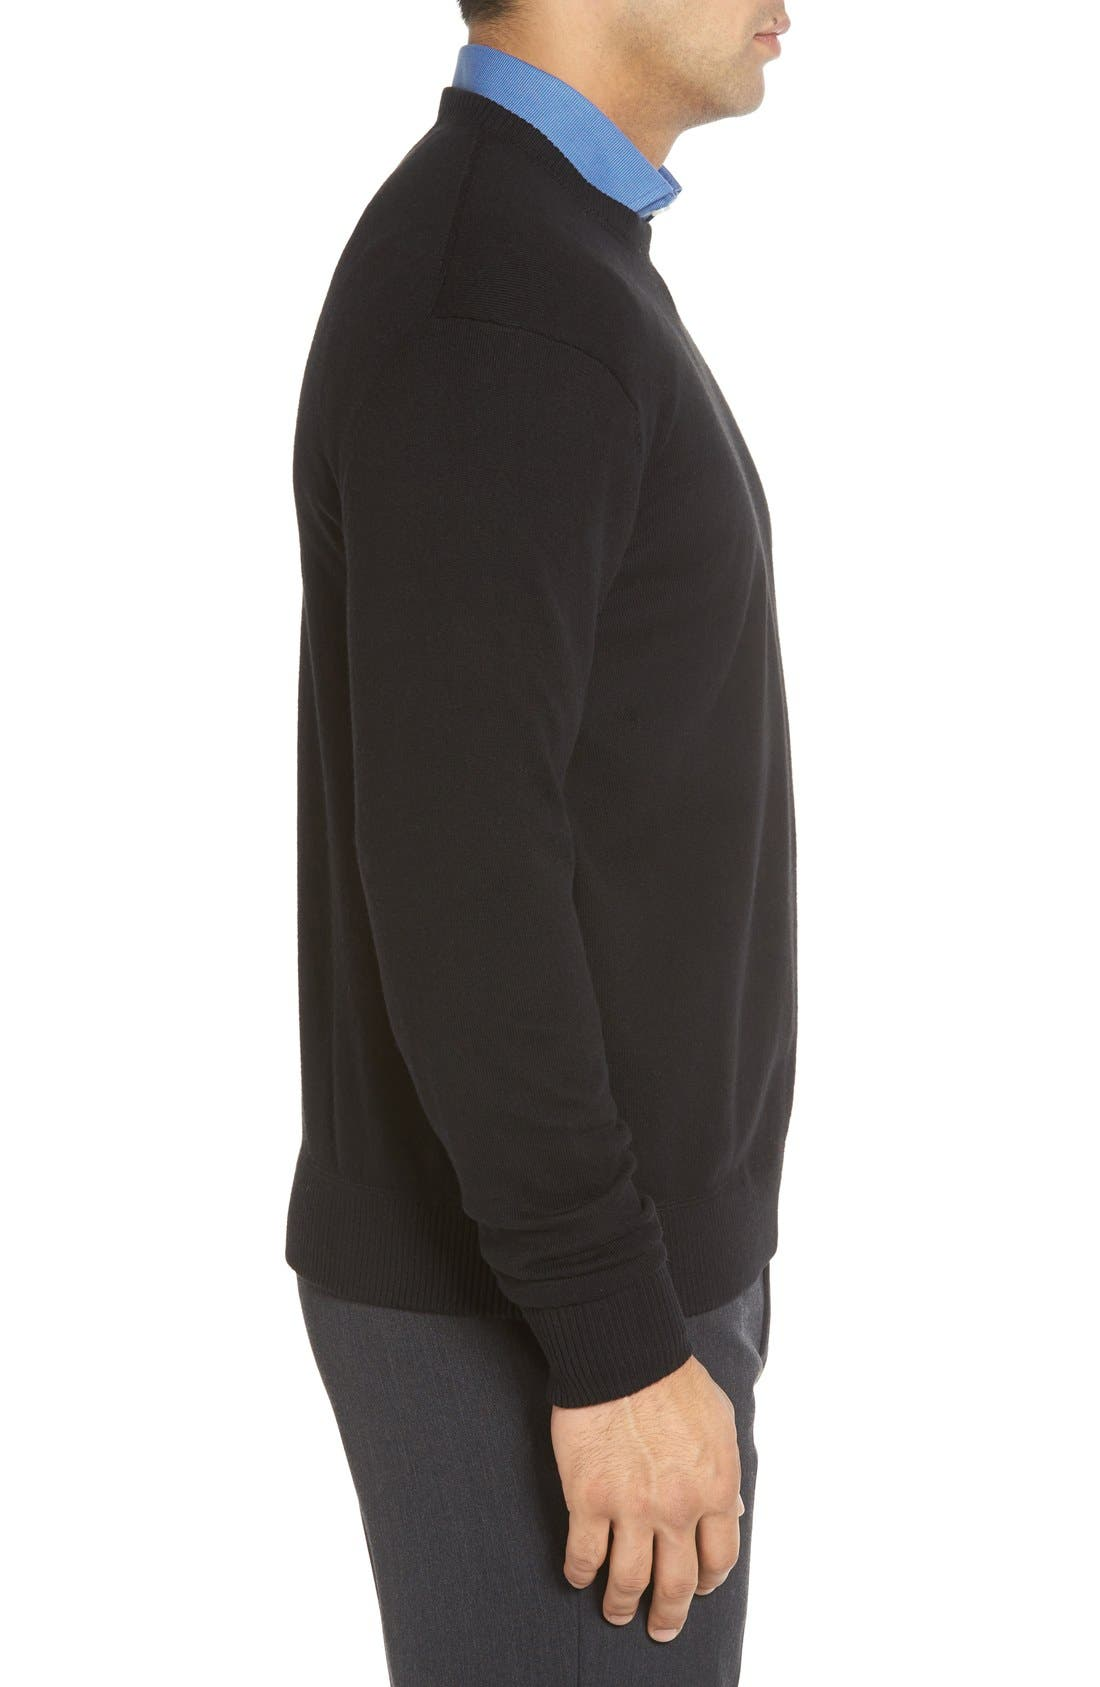 'Jersey Sport' Cotton Blend Crewneck Sweater,                             Alternate thumbnail 3, color,                             001